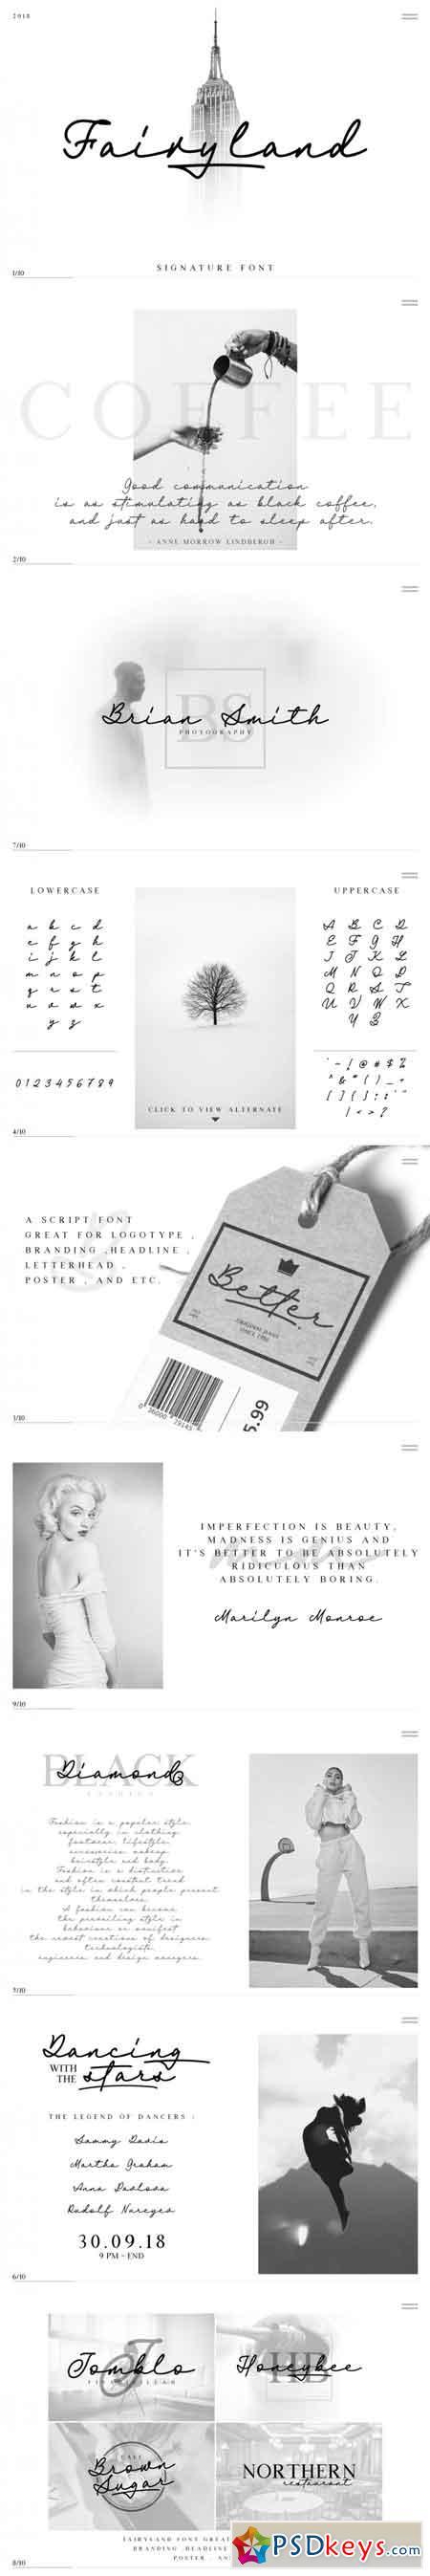 Fairyland - Classy Signature Font